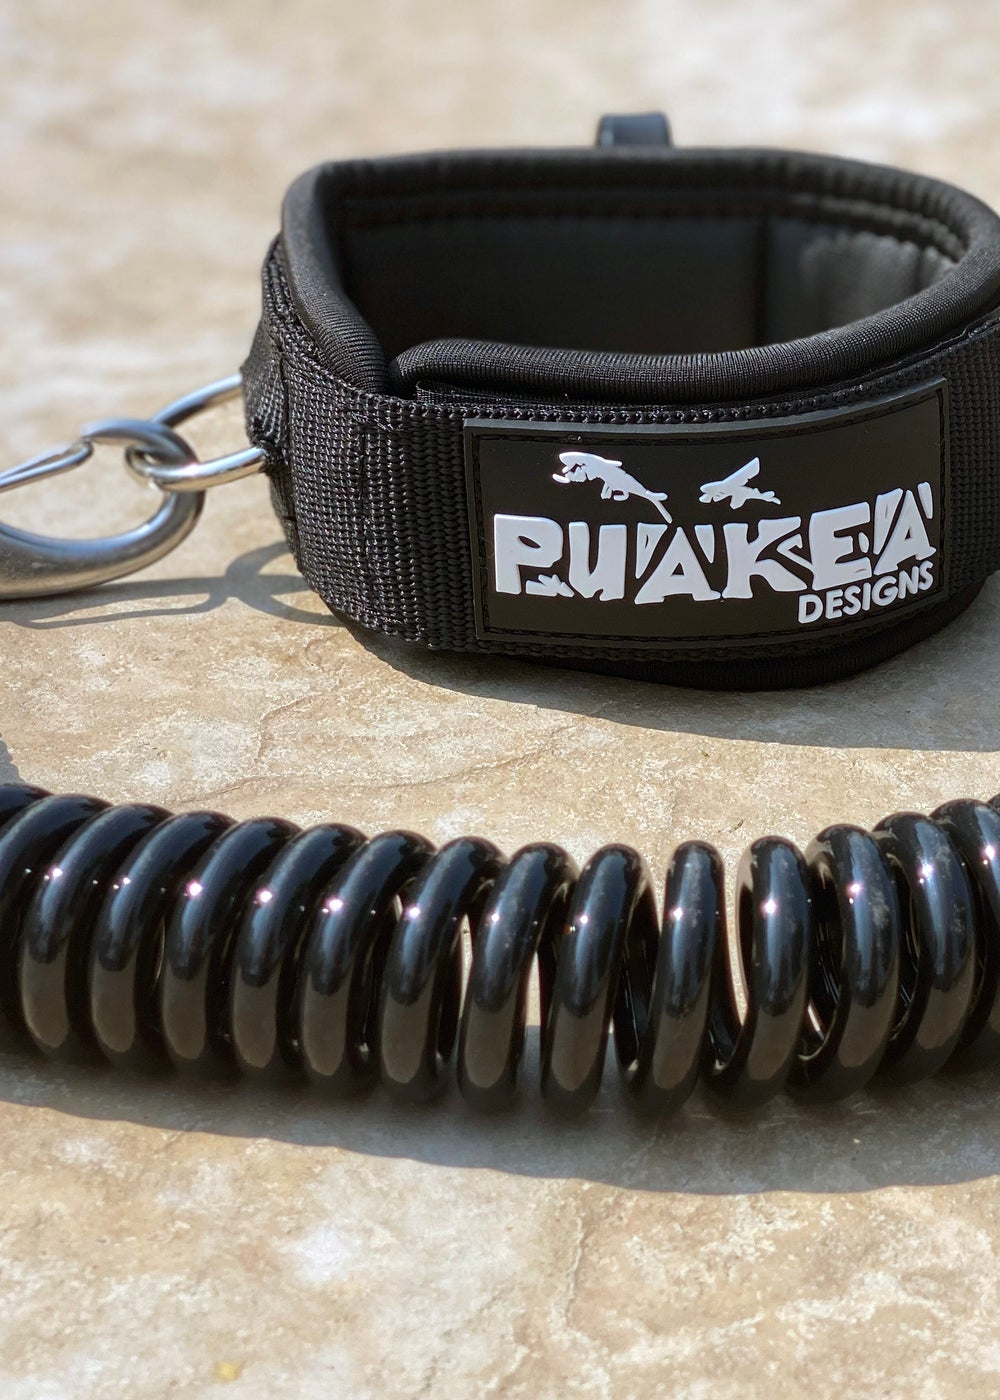 Image of Puakea OC Quick Release Leash